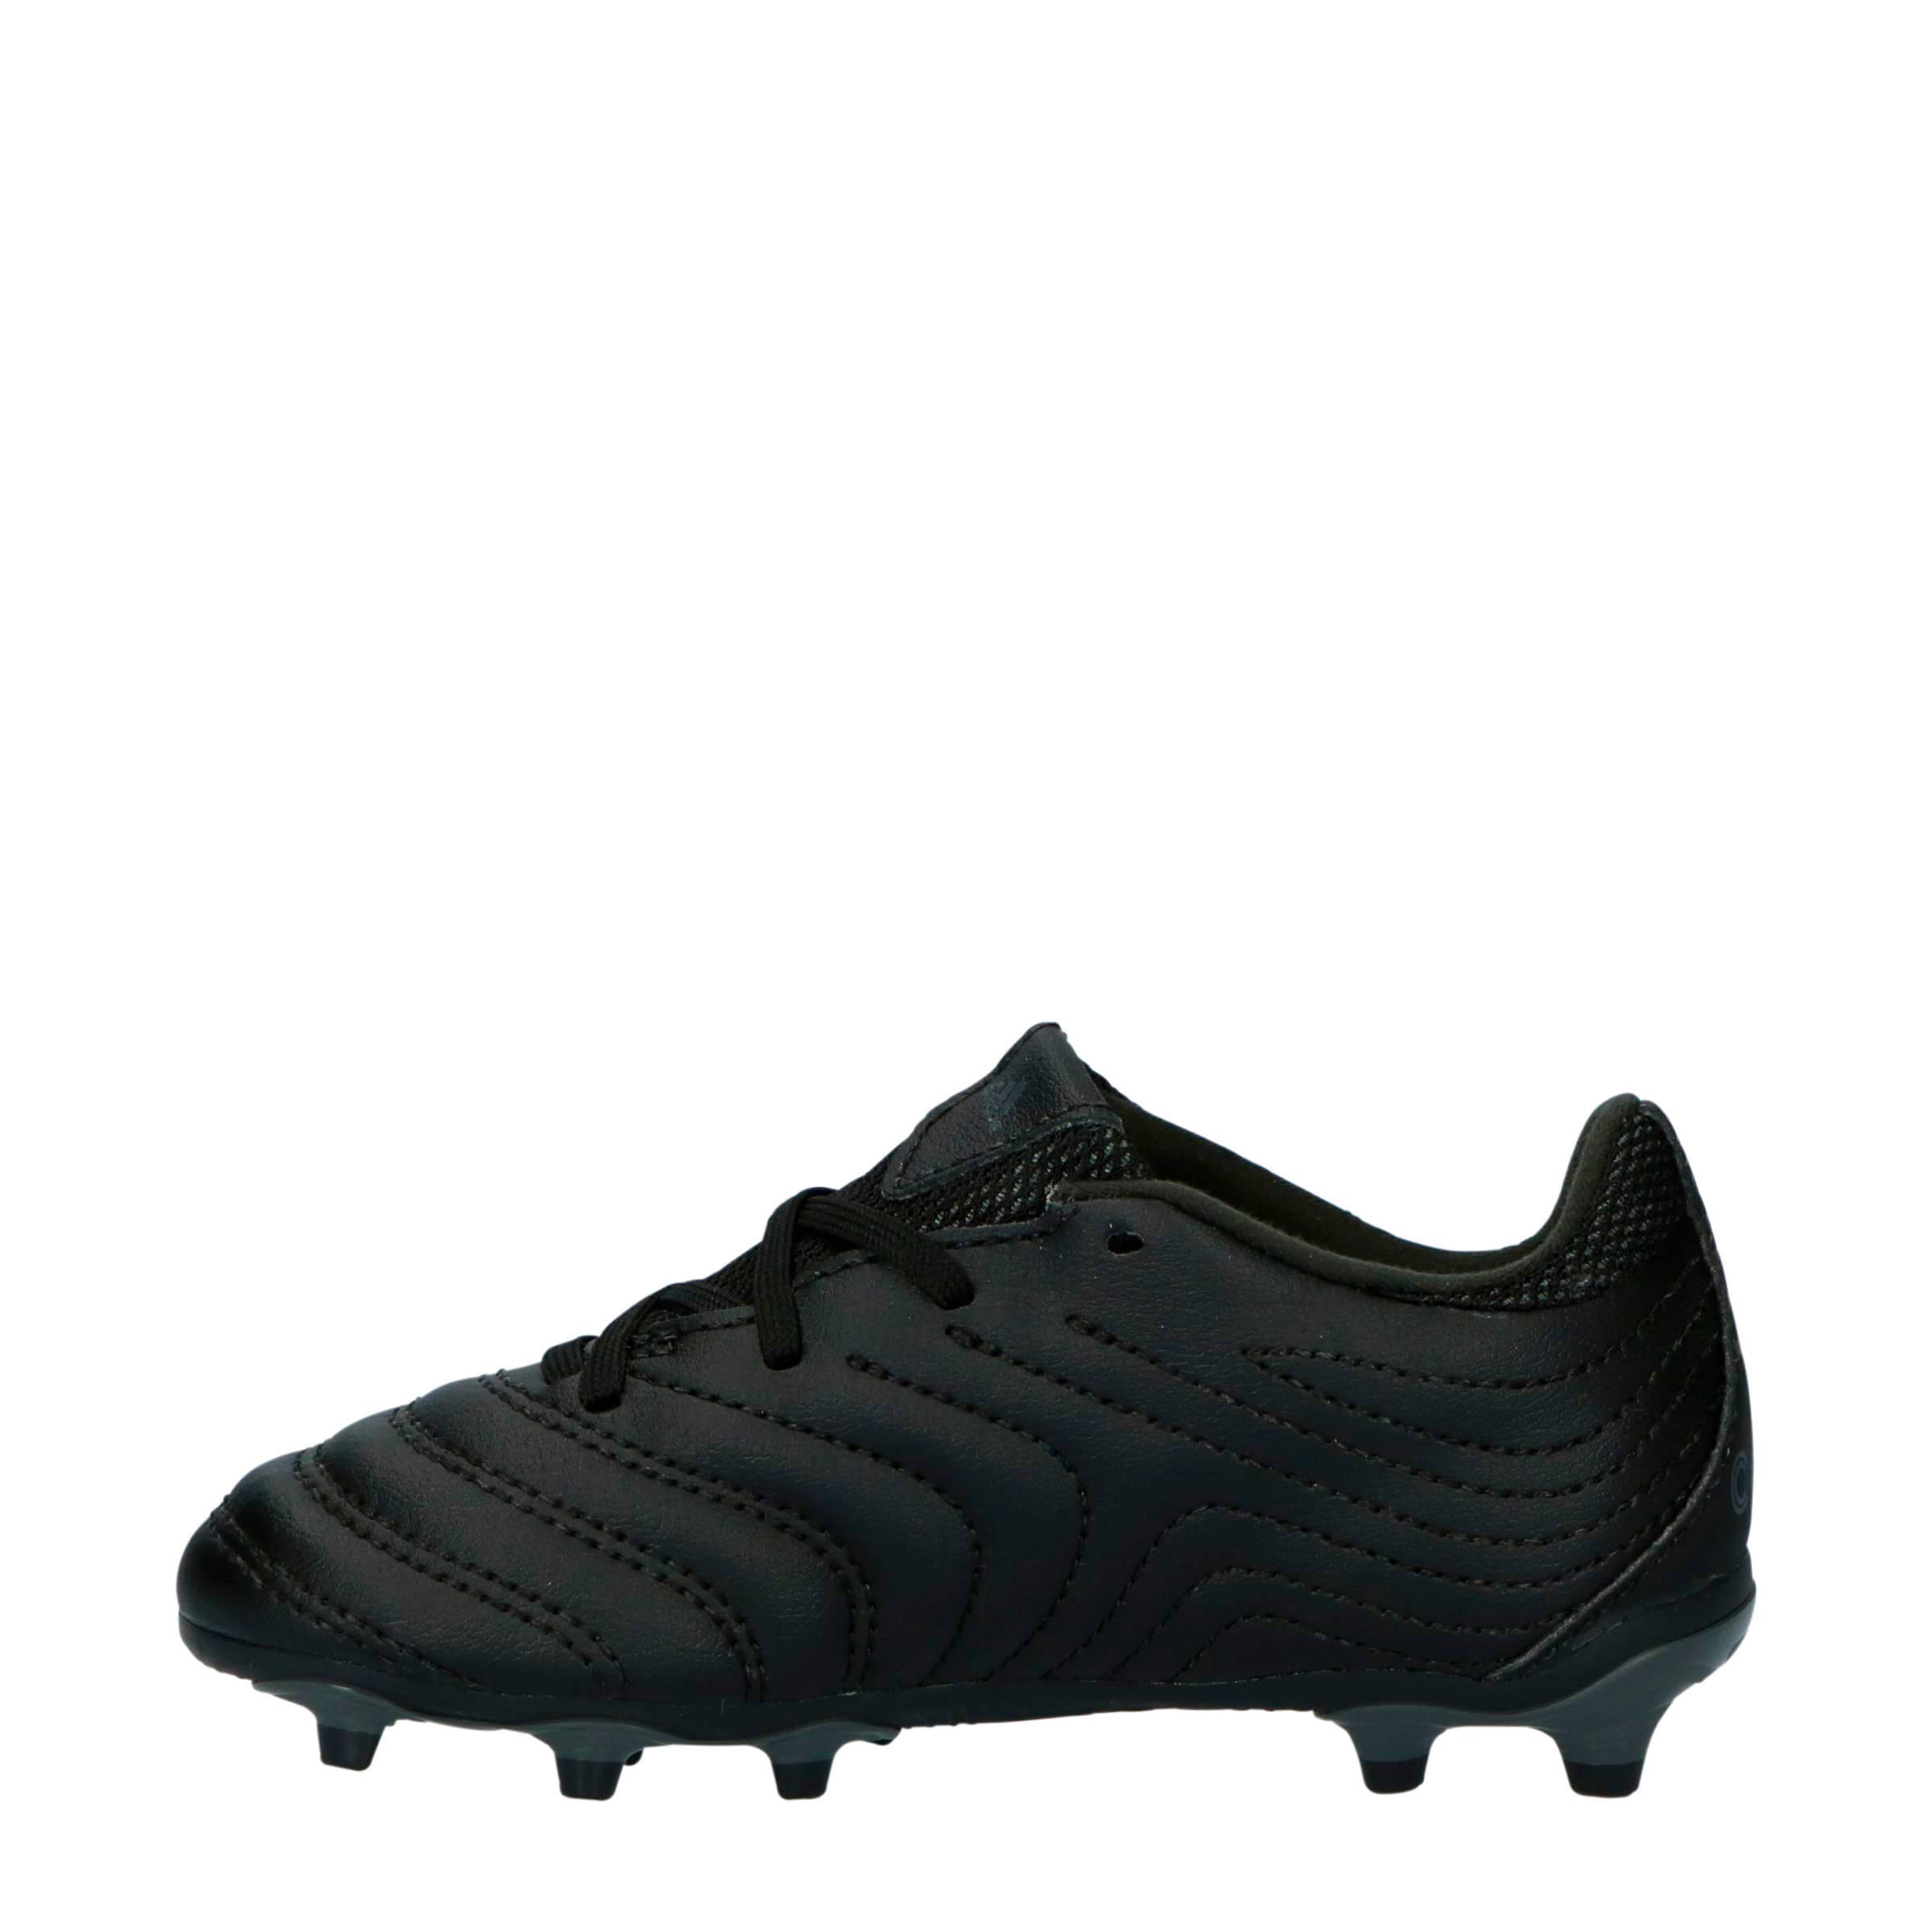 newest 0cfc7 b1012 adidas performance COPA 19.3 FG jr voetbalschoenen zwart  we